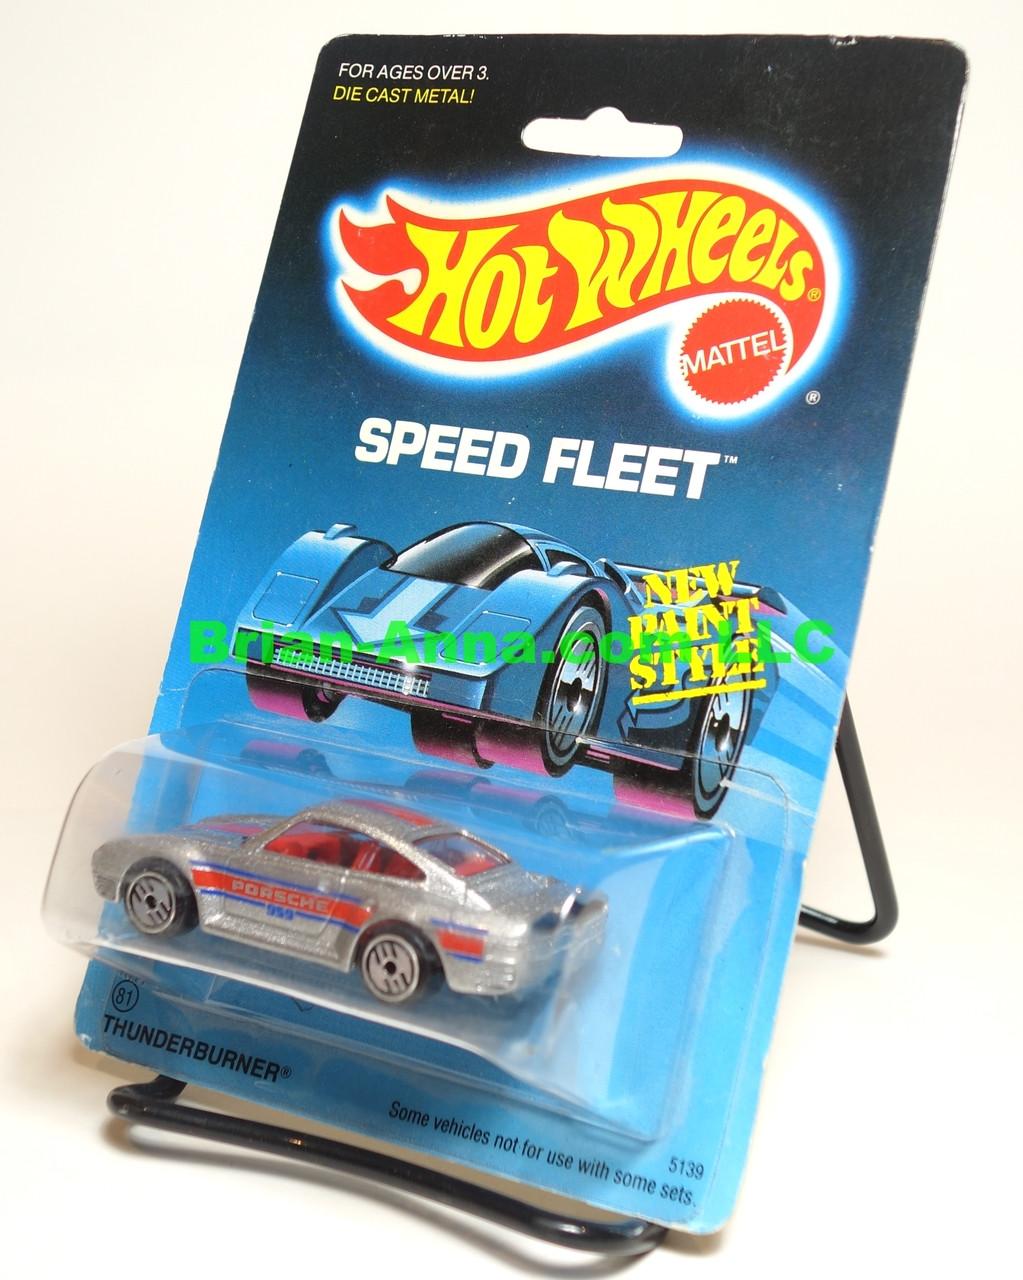 Hot Wheels Prototype/Sample, Porsche 959, Metalflake Silver, Red Interior, UH wheels